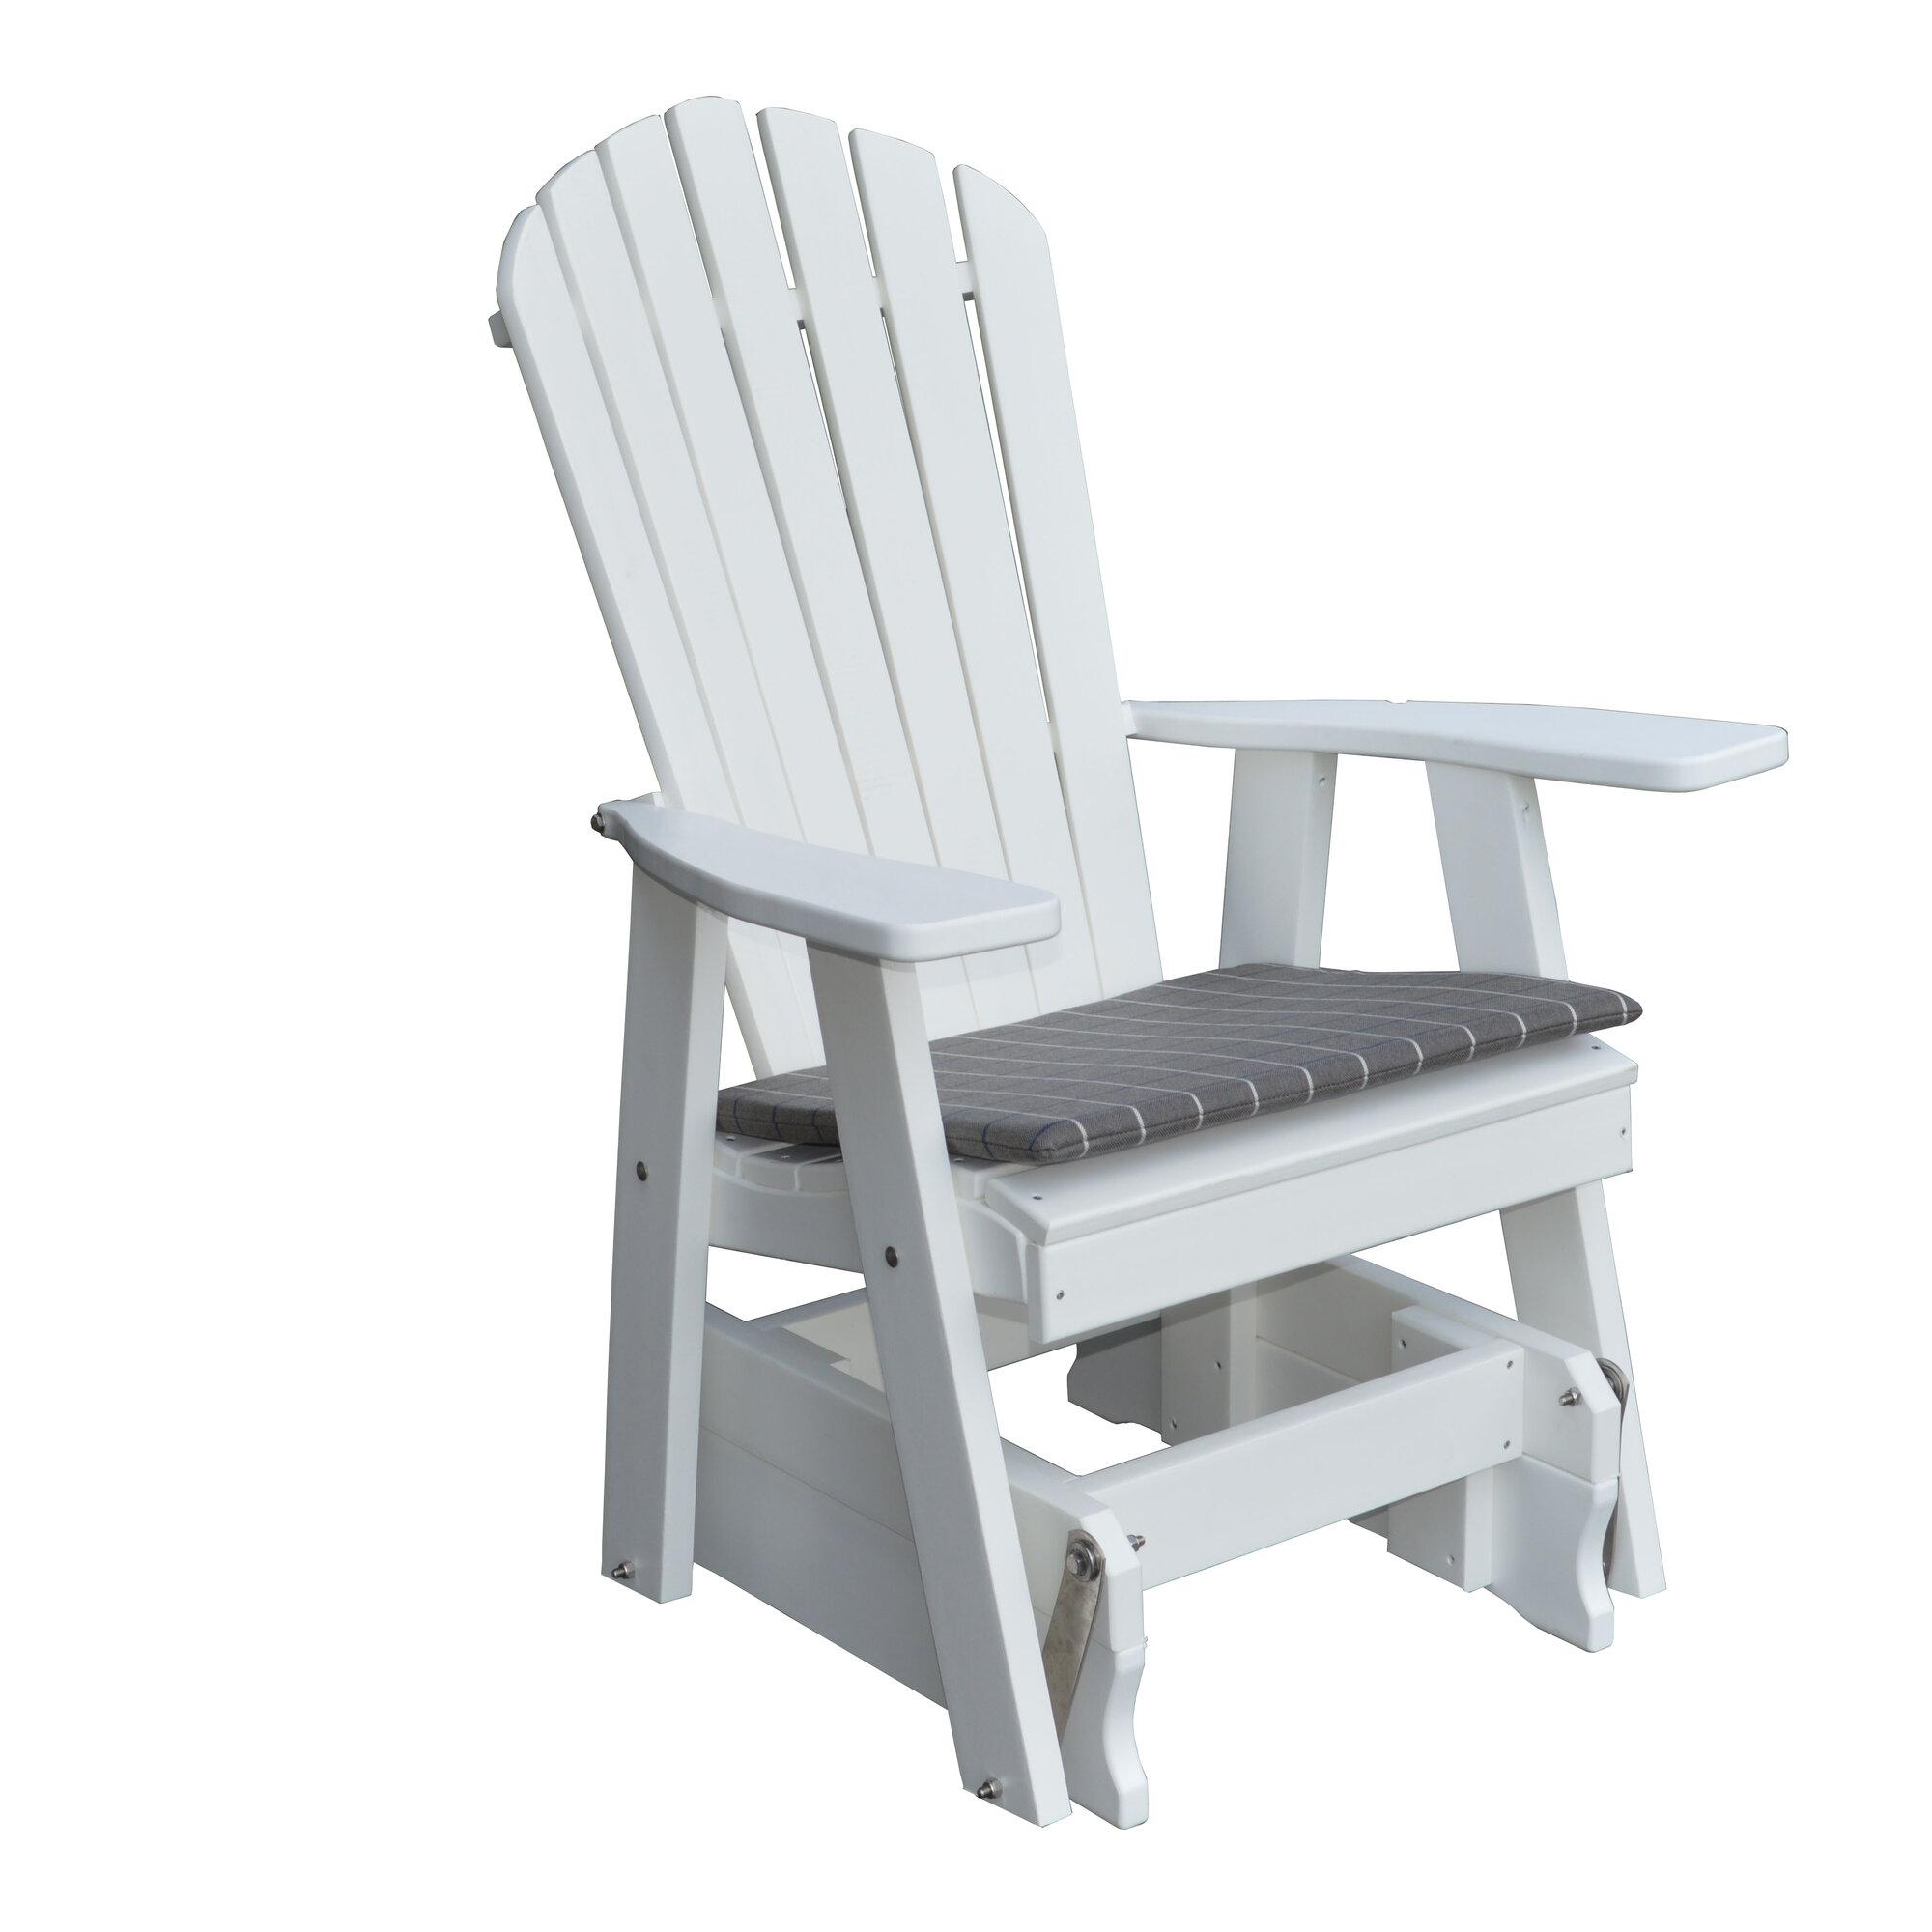 Radionic Hi Tech Newport Adirondack Chair EBay